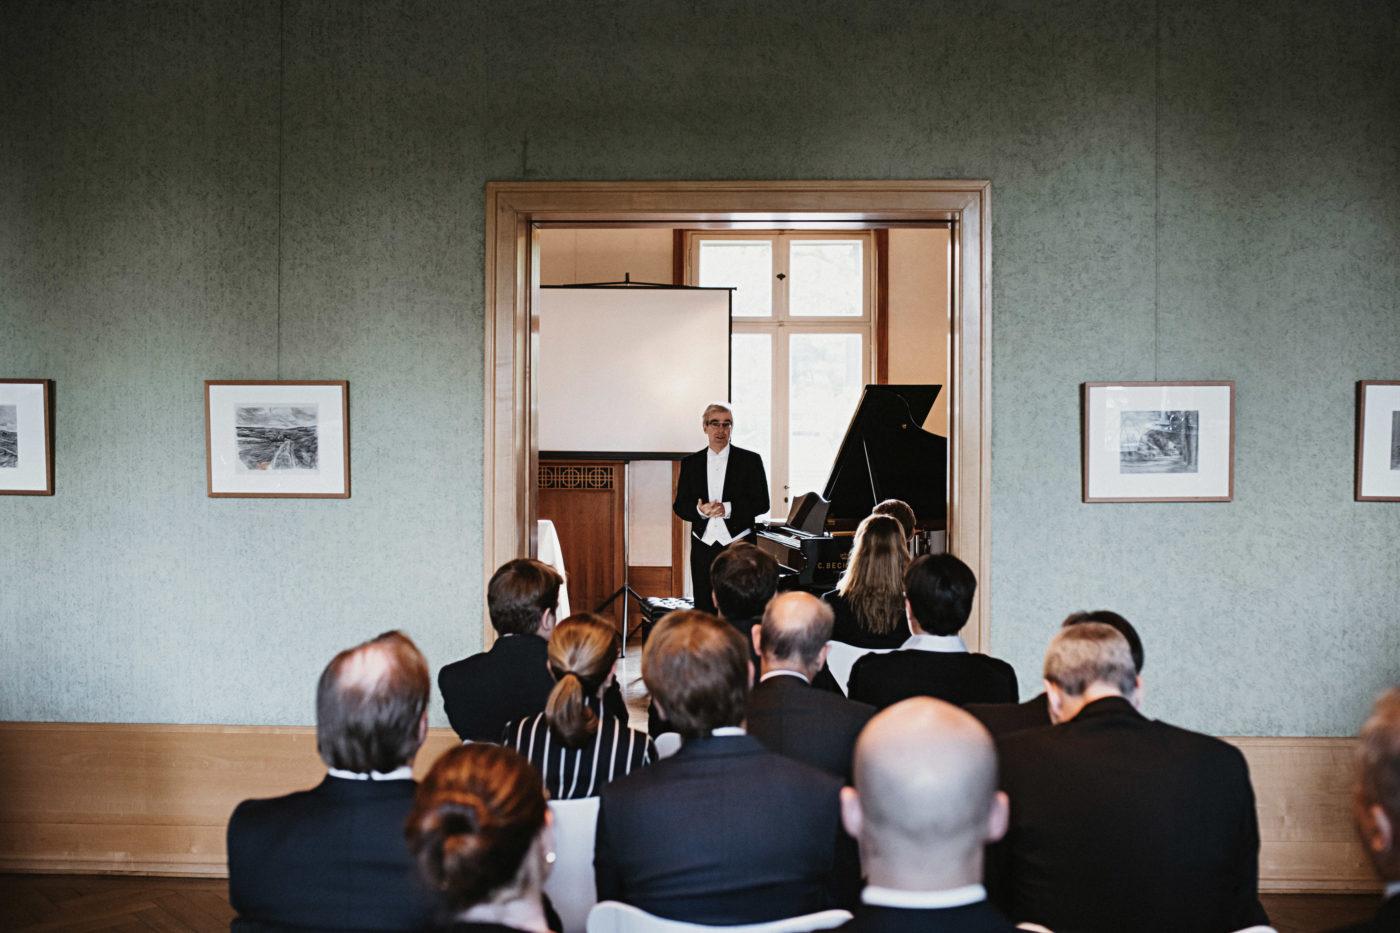 Event PATRIZIA Klavierrezital 2019 Wannsee - Andreas Weimer